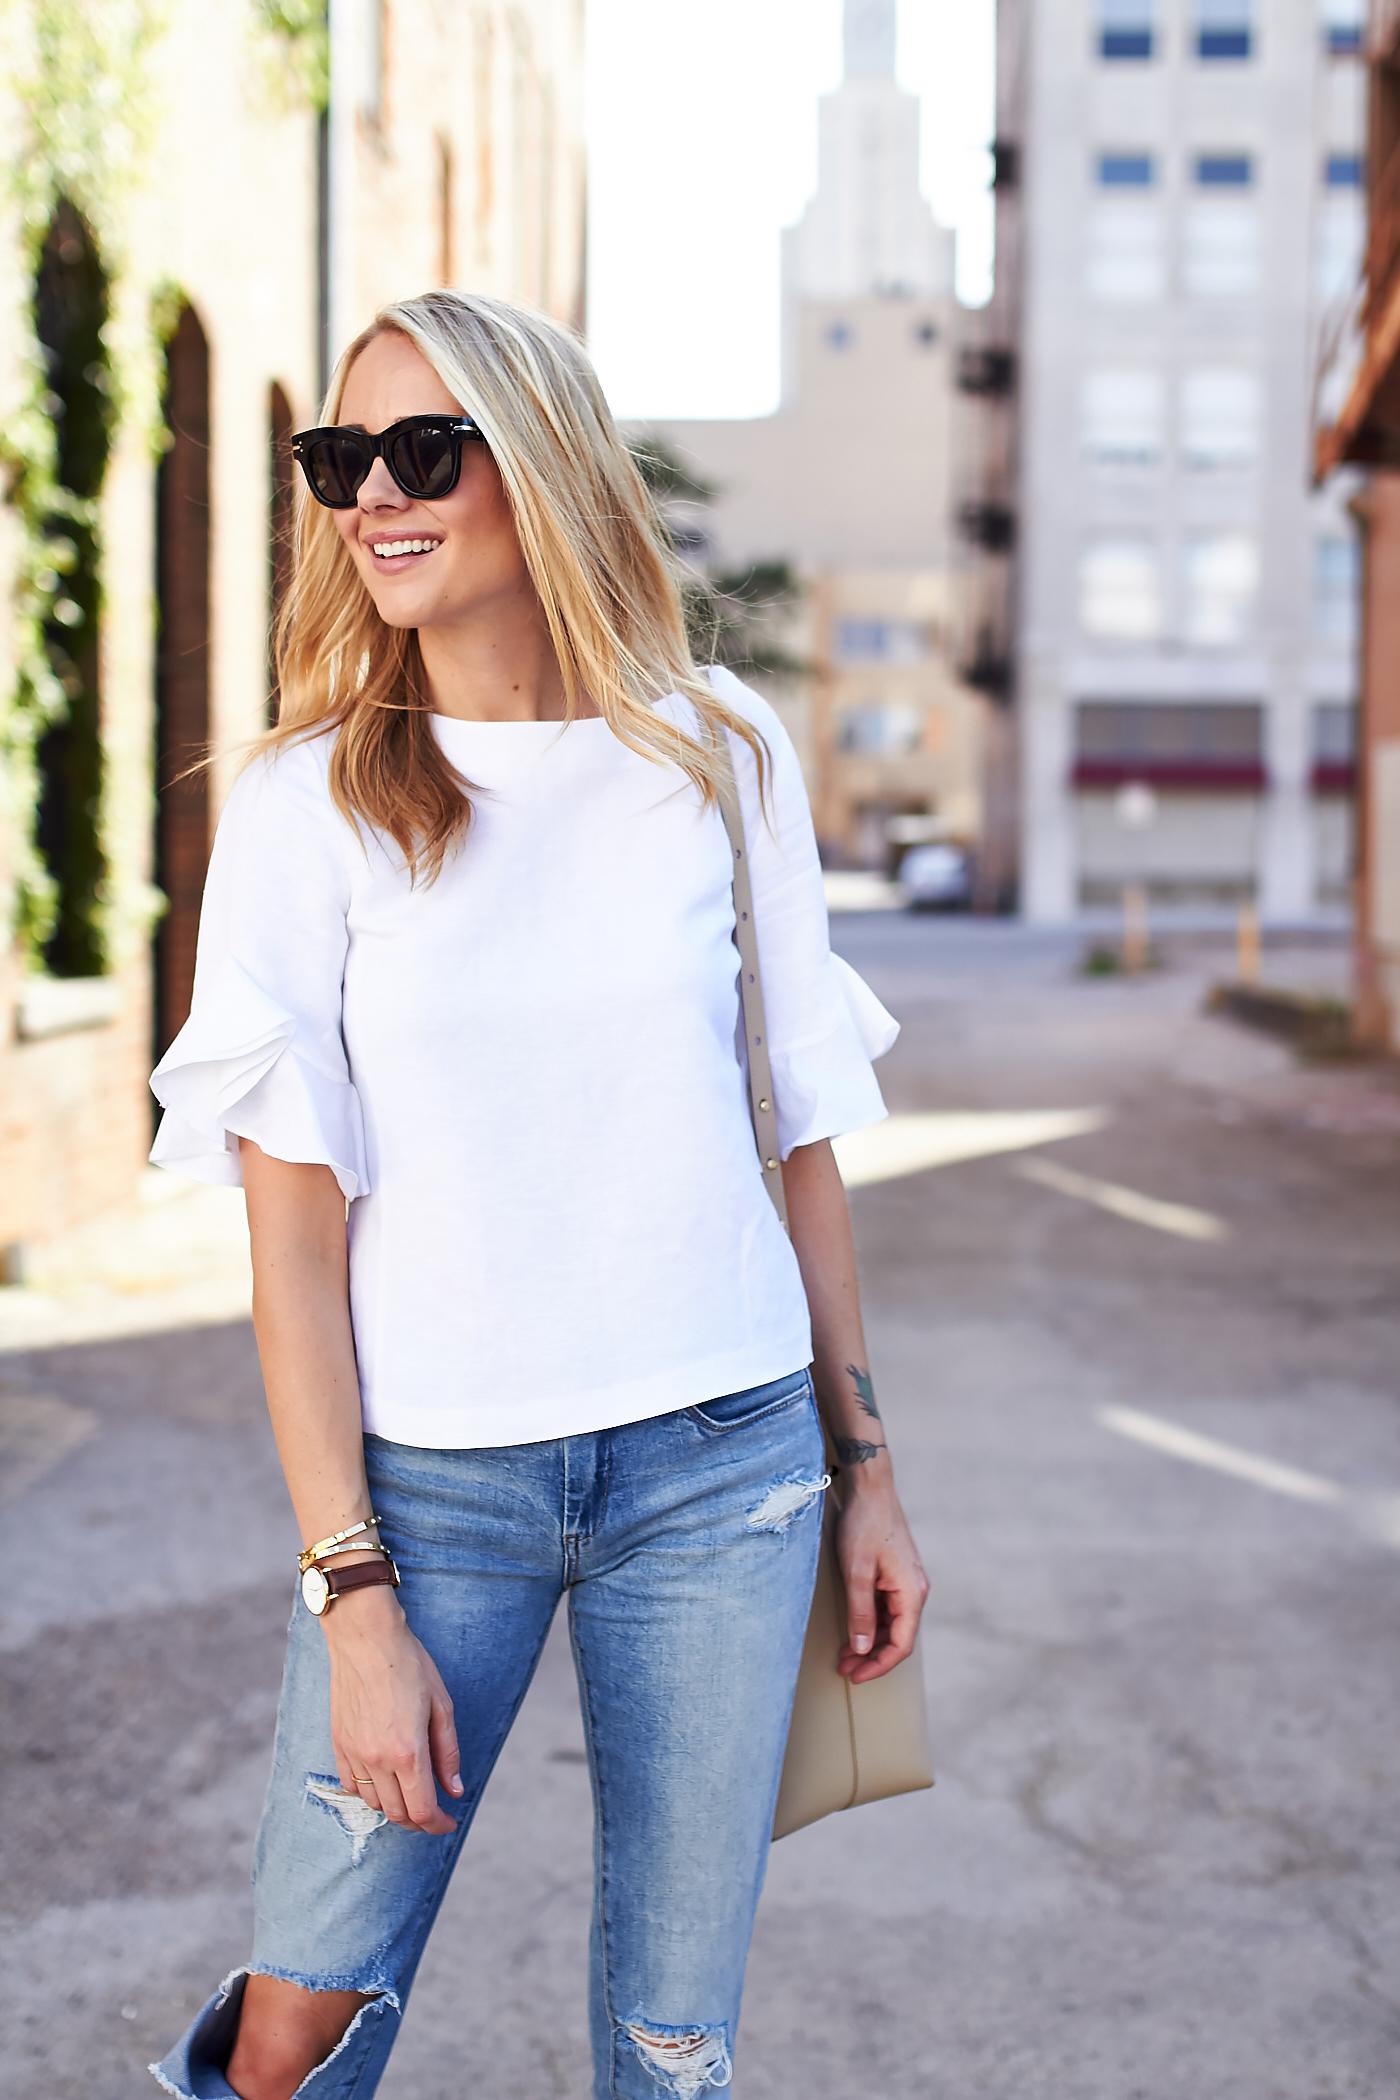 Celine Sunglasses Nordstrom  ruffle sleeve top ripped skinny jeans fashion jackson